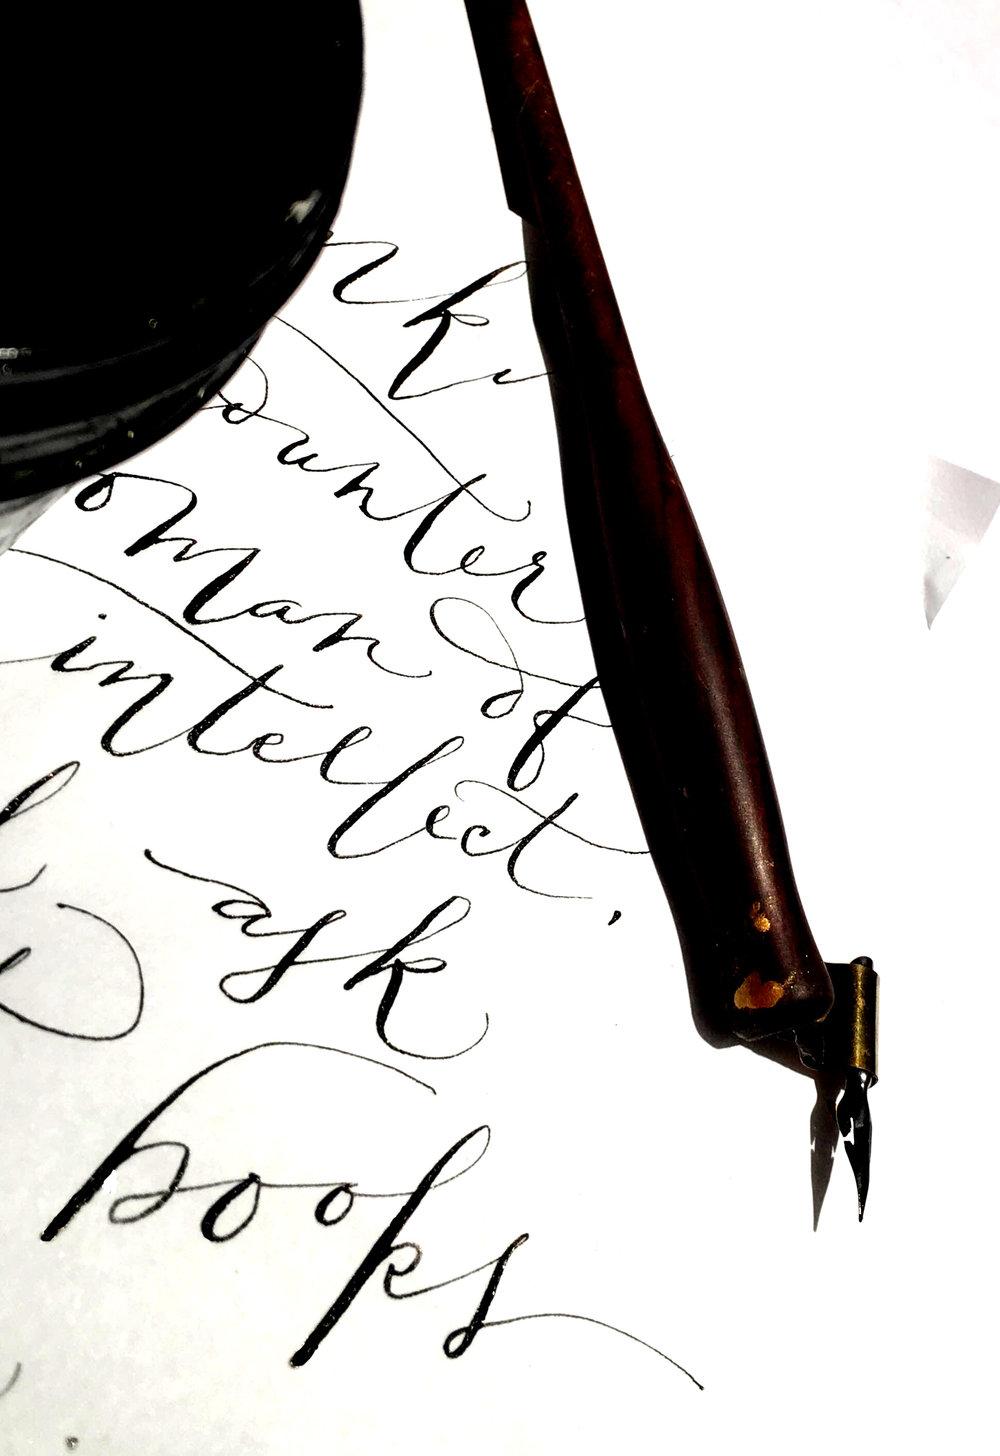 Custom calligraphy in mid-Missouri | Inkling Calligraphy & Illustration